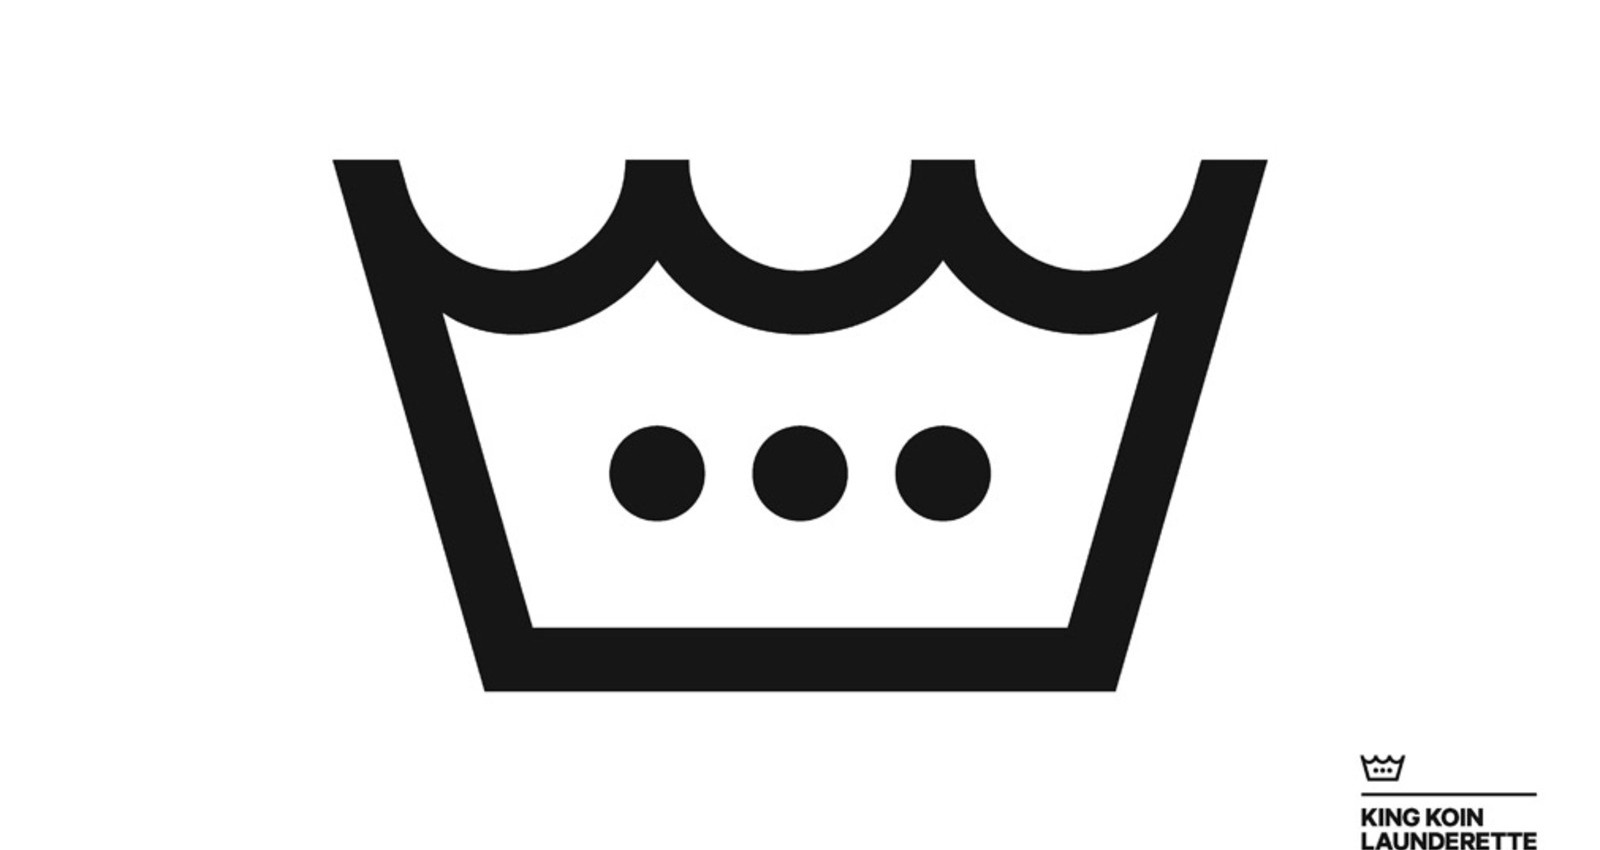 King Koin Launderette Stationery